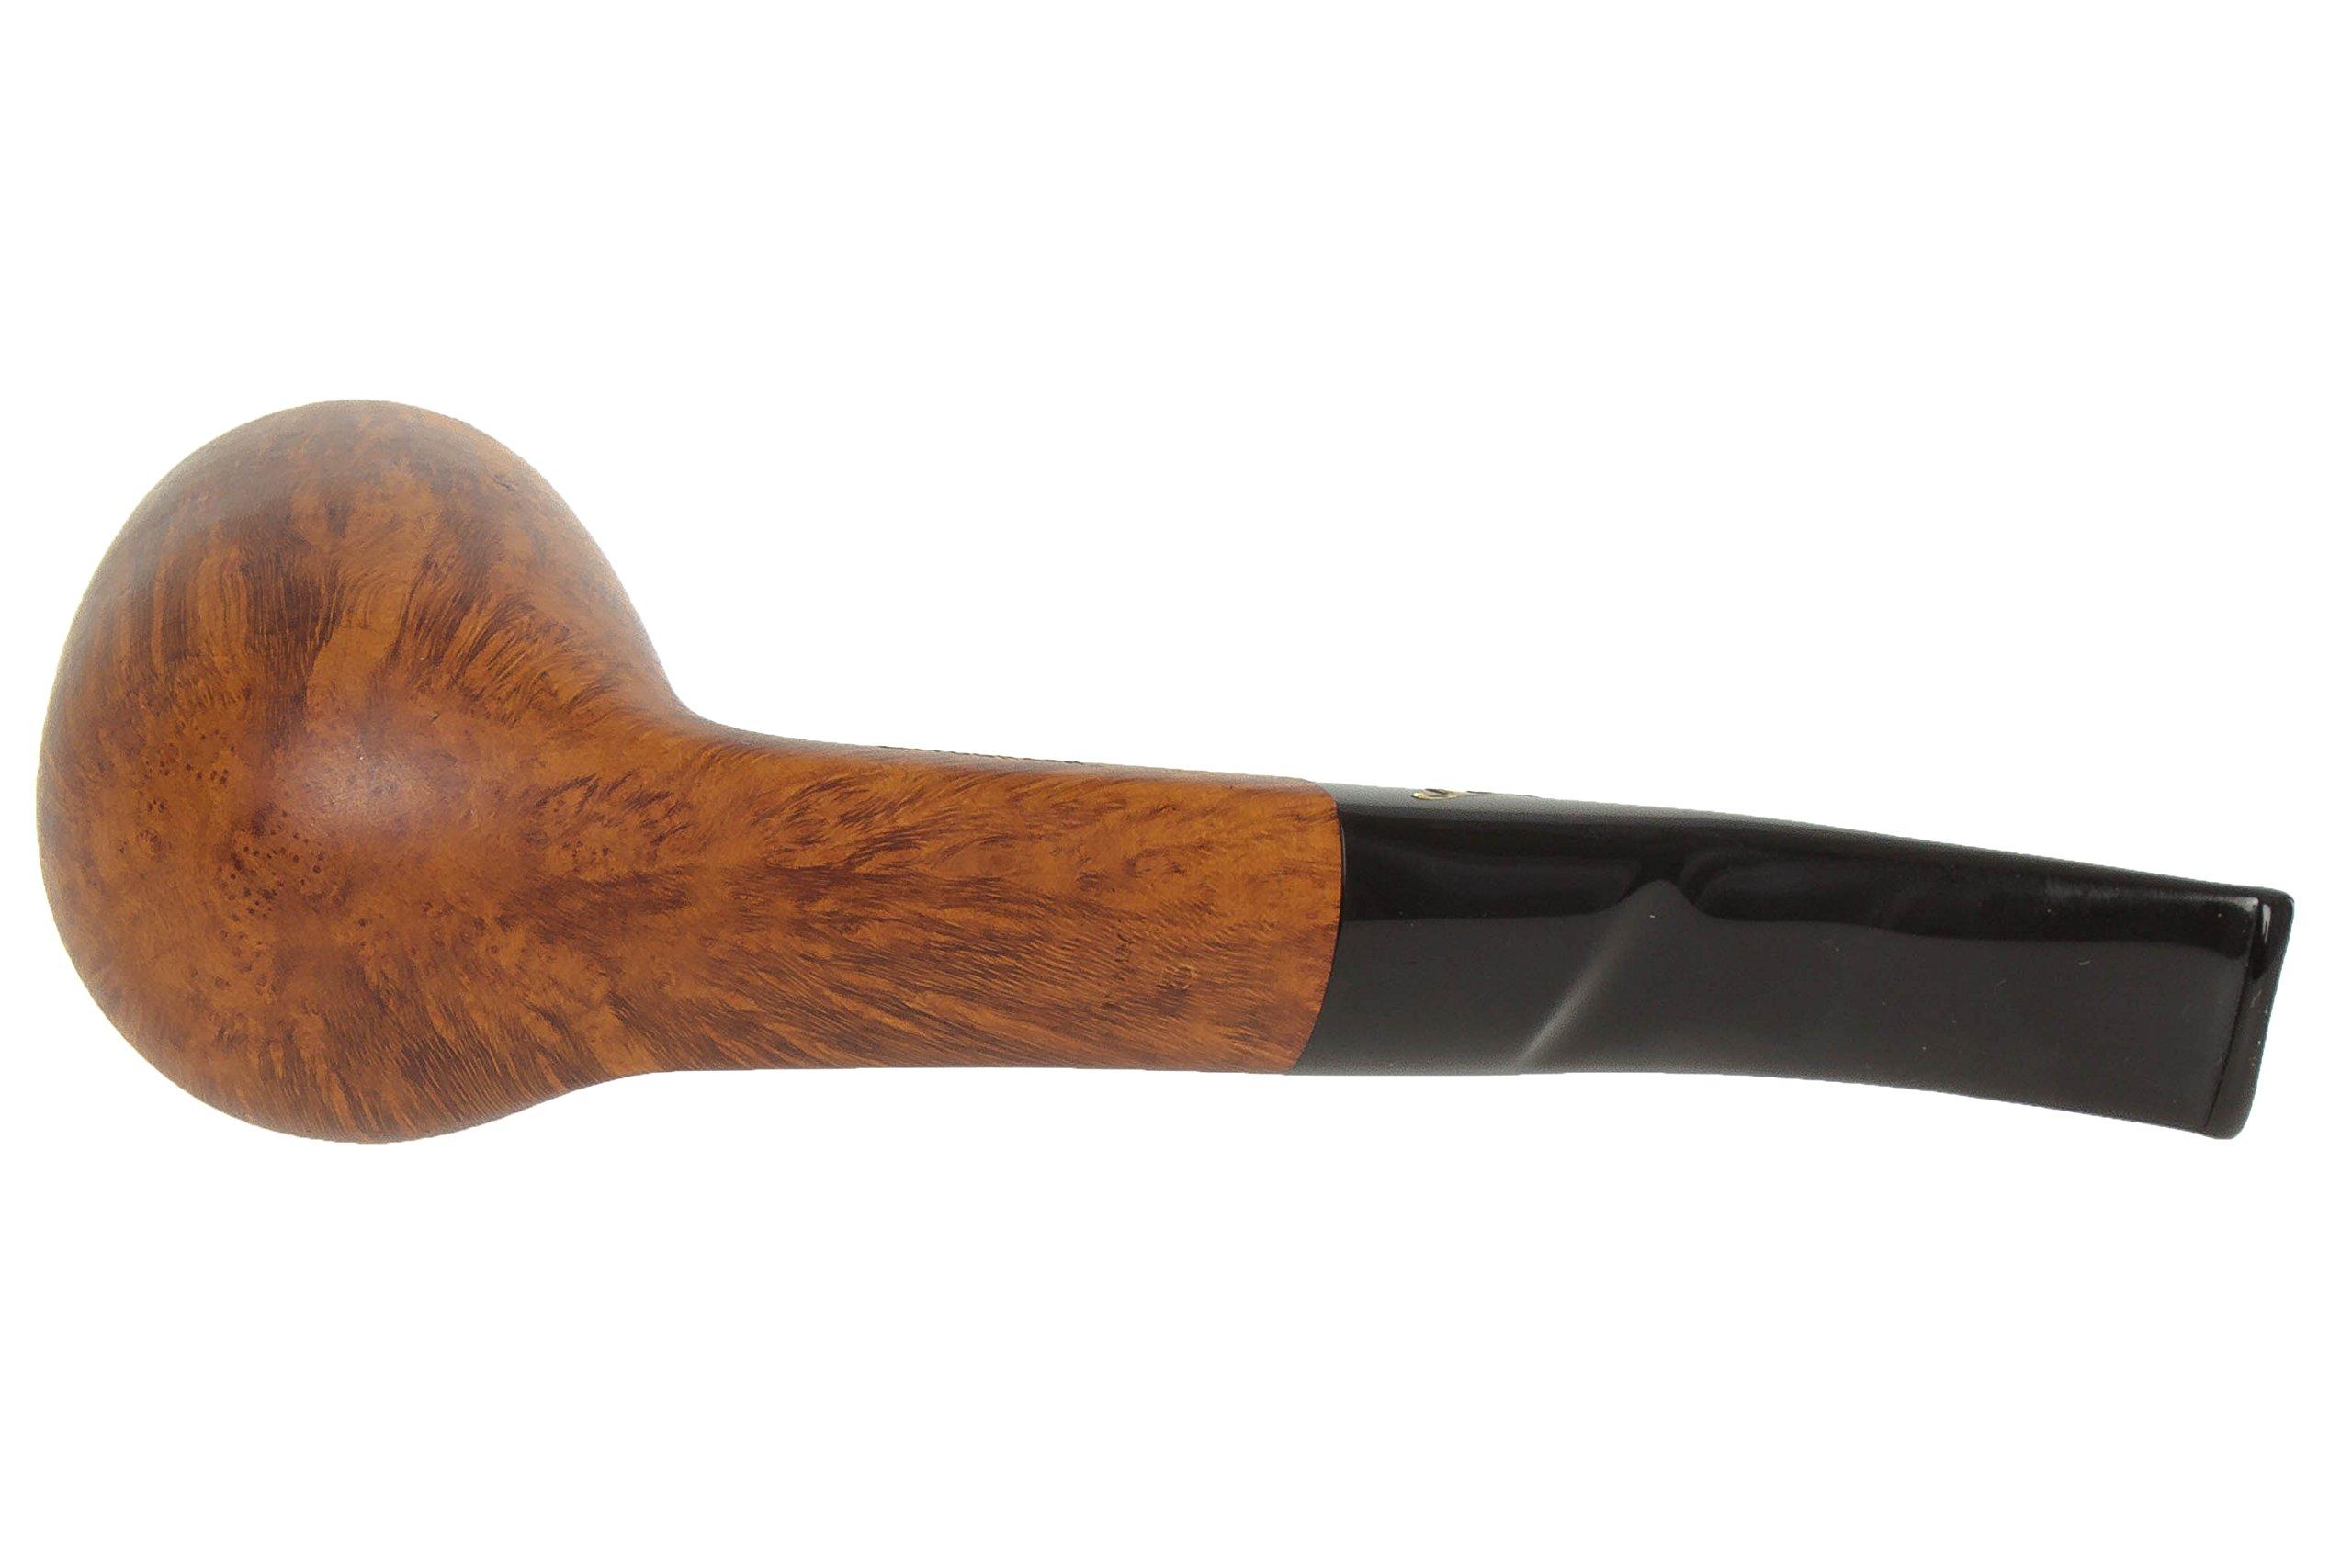 Savinelli Autograph Smooth 5 Tobacco Pipe - TP4122 by Savinelli (Image #4)